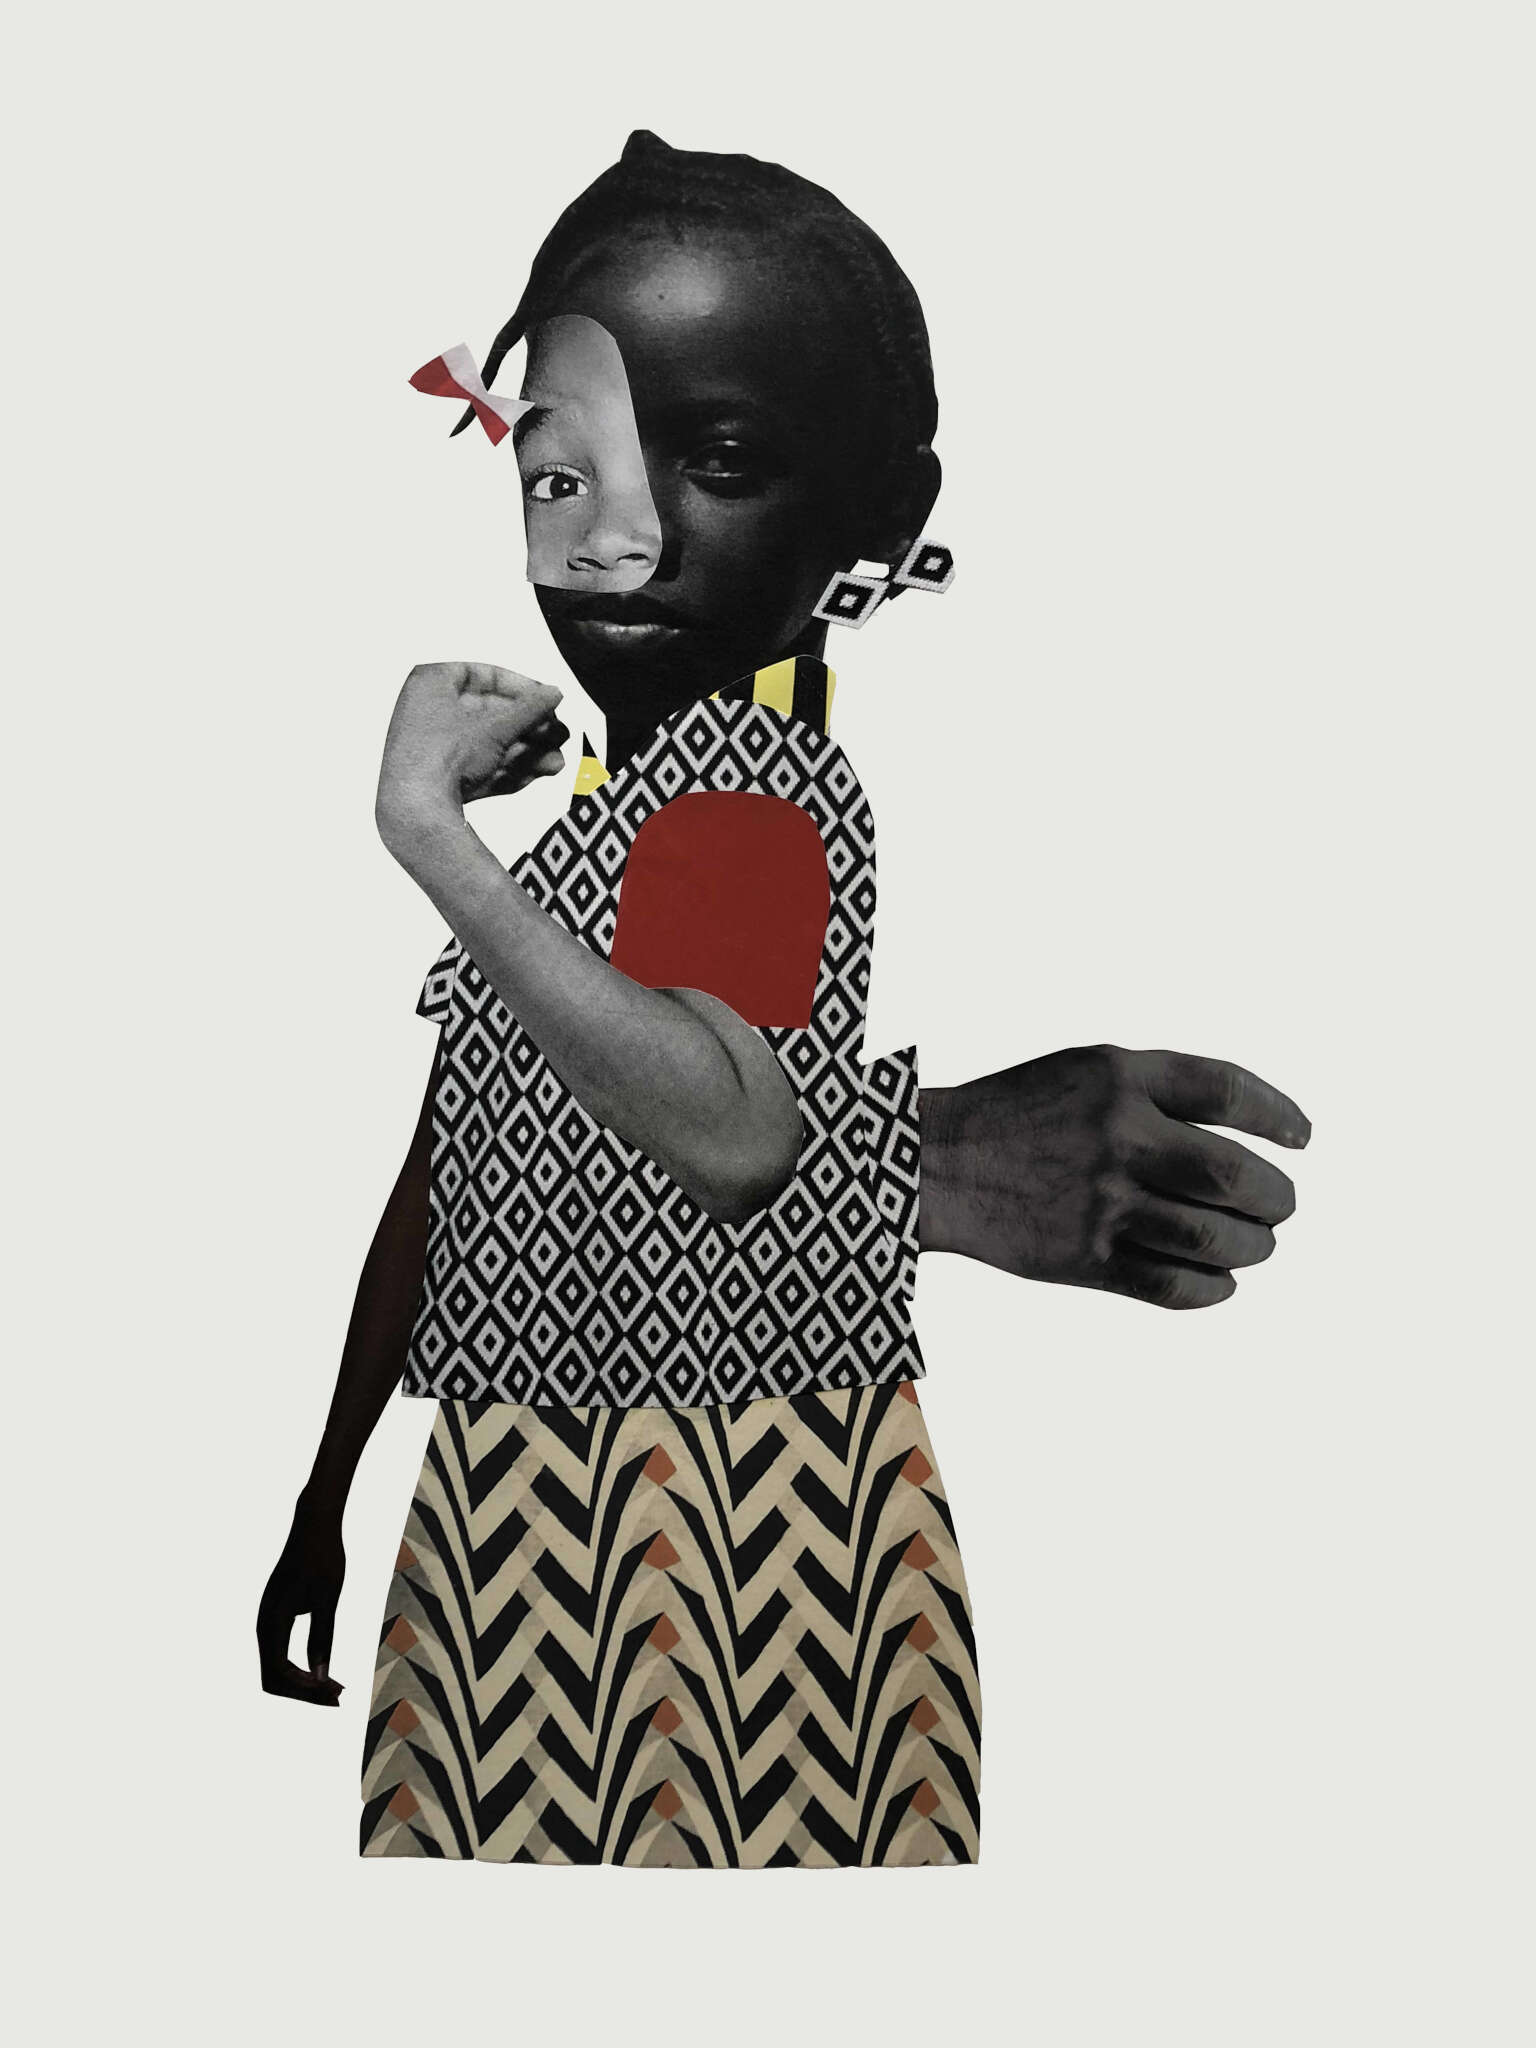 Deborah Roberts, 'Untitled 2018'. Copyright of the artist. Courtesy of Stephen Friedman Gallery